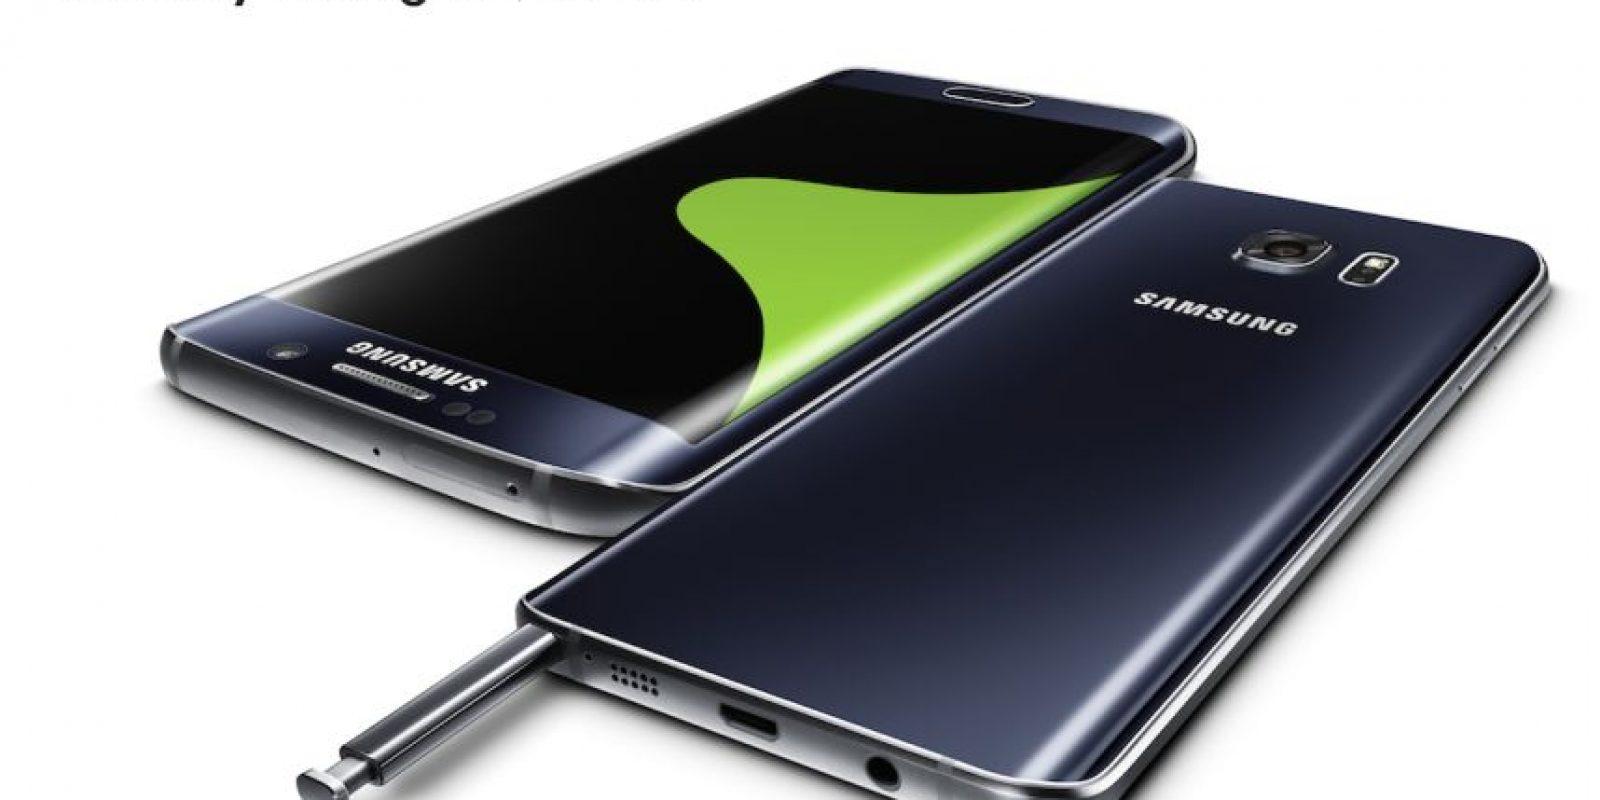 Memoria RAM: 4 GB DDR4. Foto:Samsung